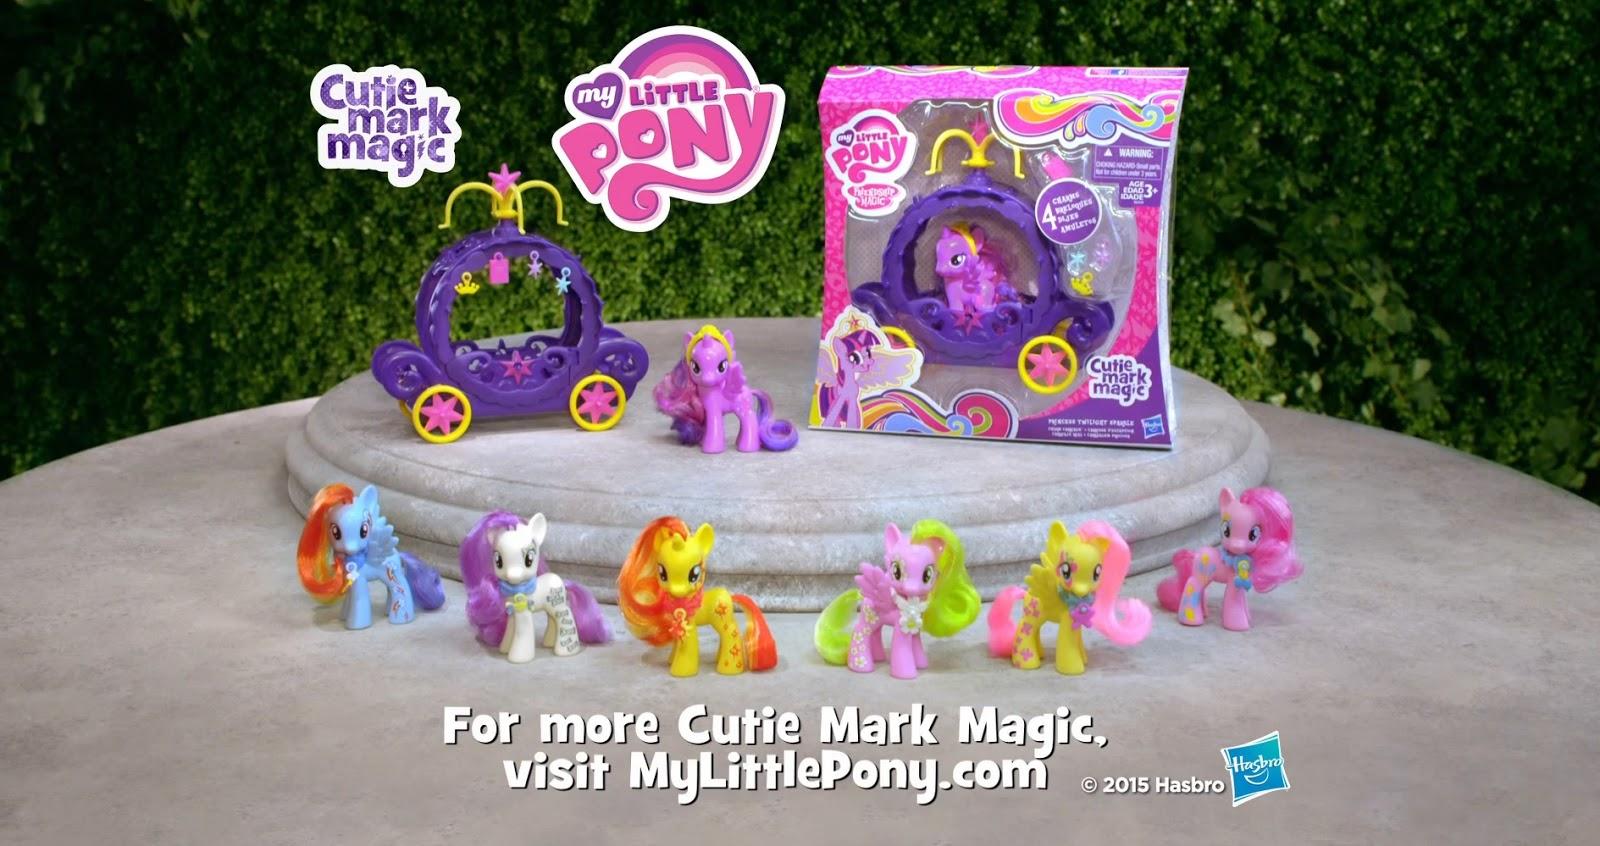 Mlp cutie mark magic commercial